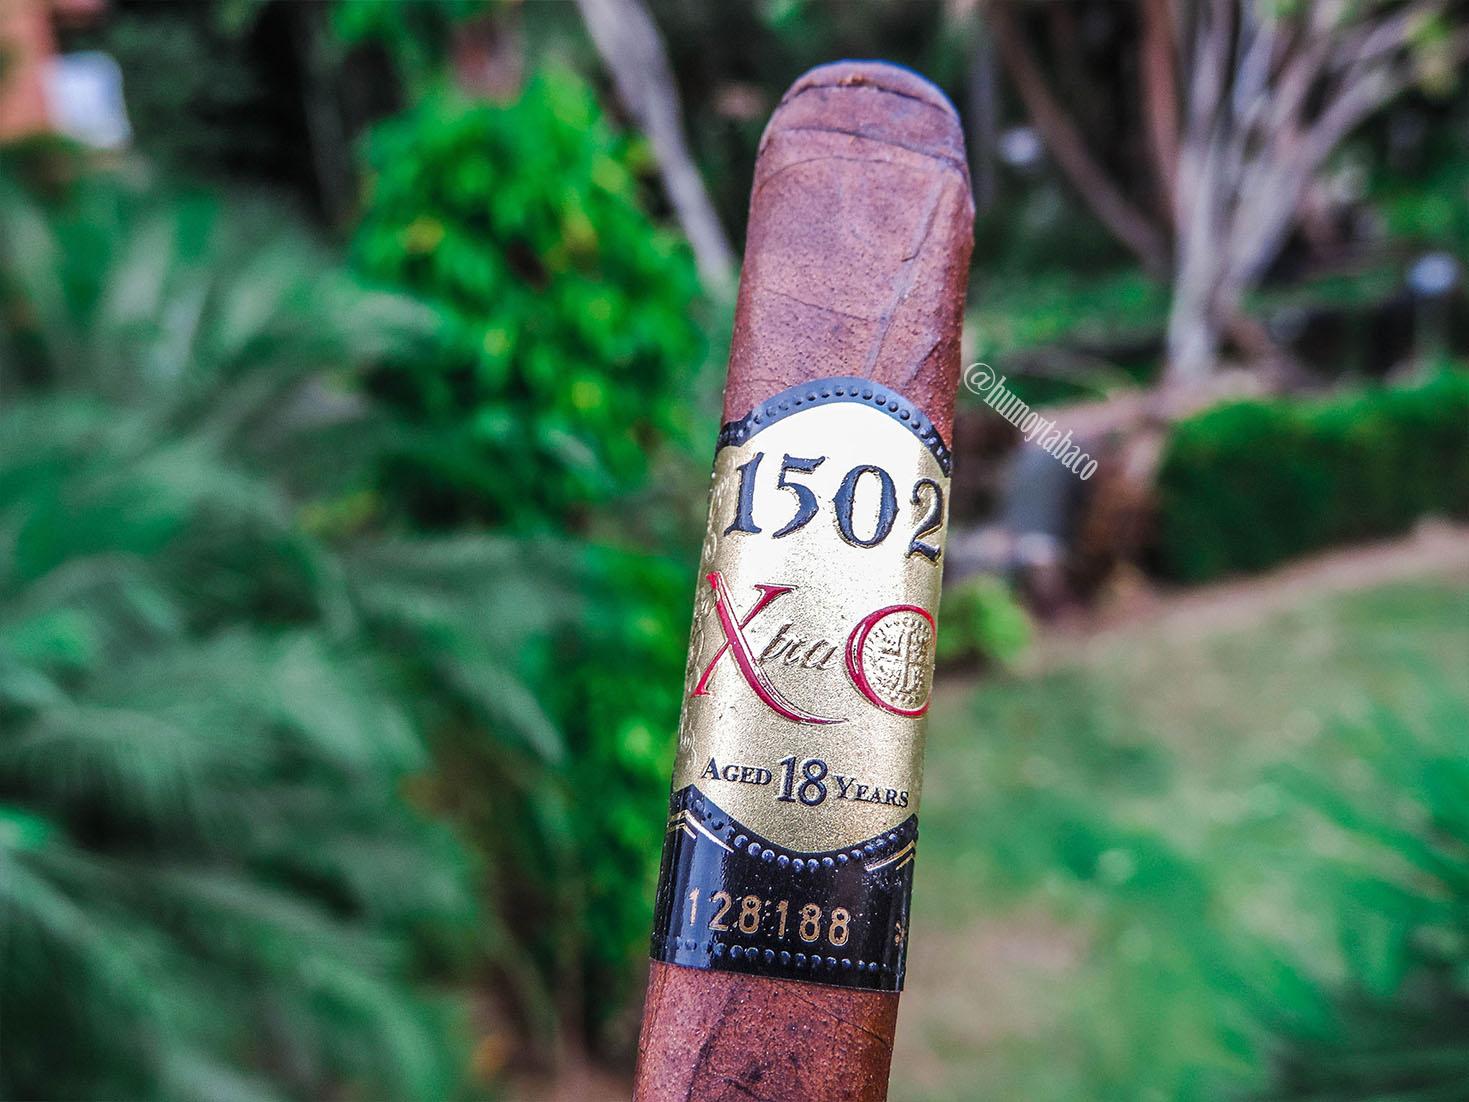 1502 - XO 01